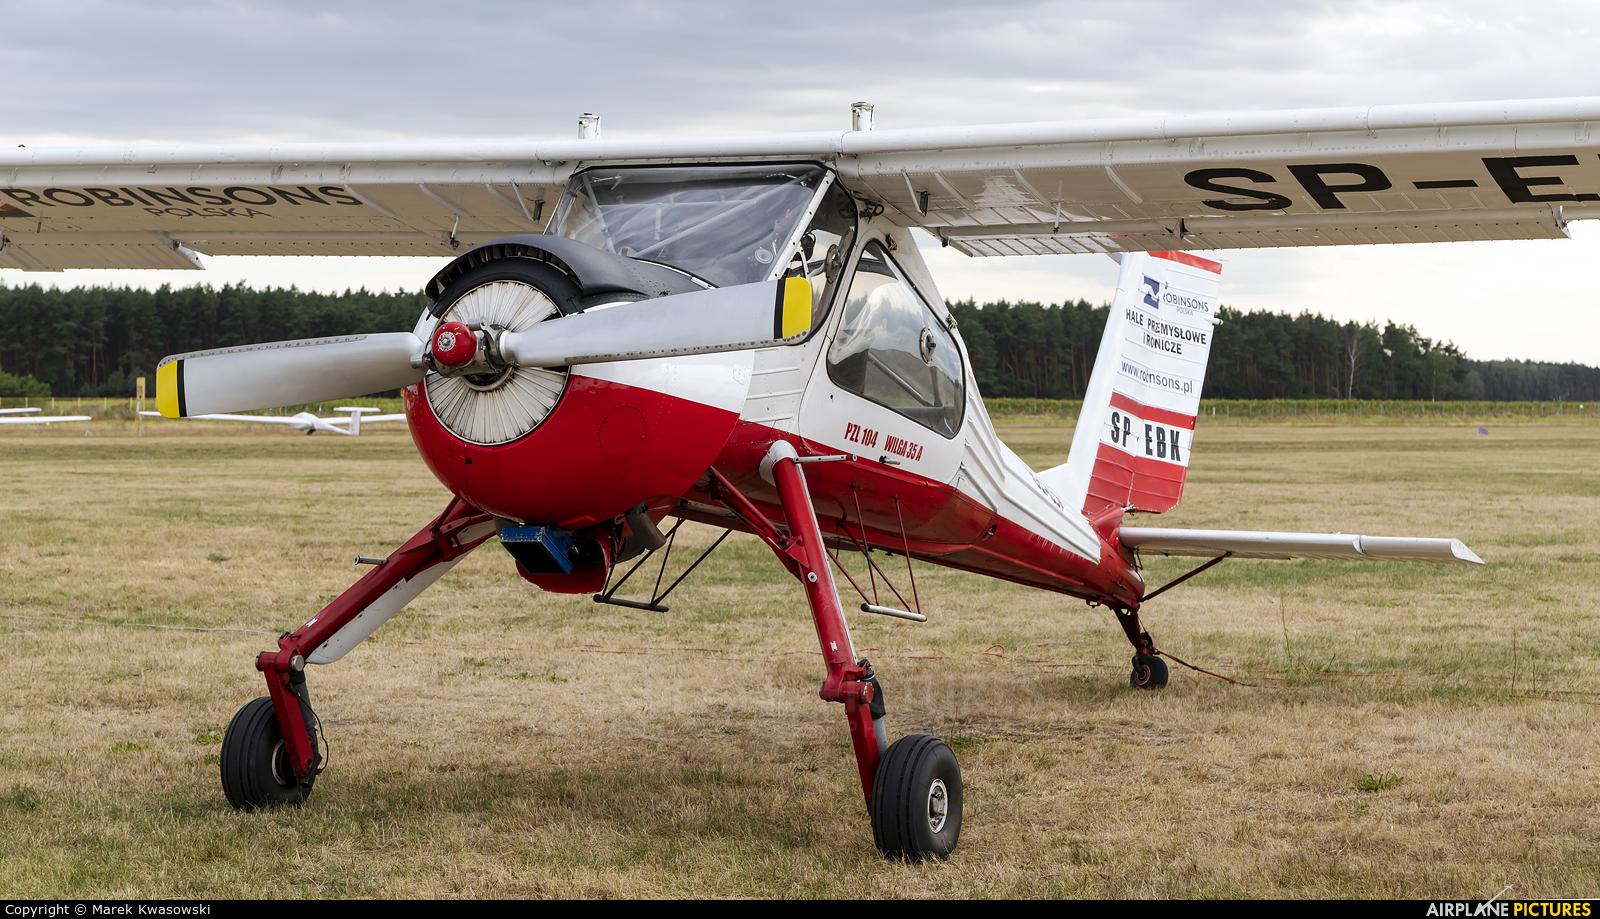 Aeroklub Polski SP-EBK aircraft at Leszno - Strzyżewice